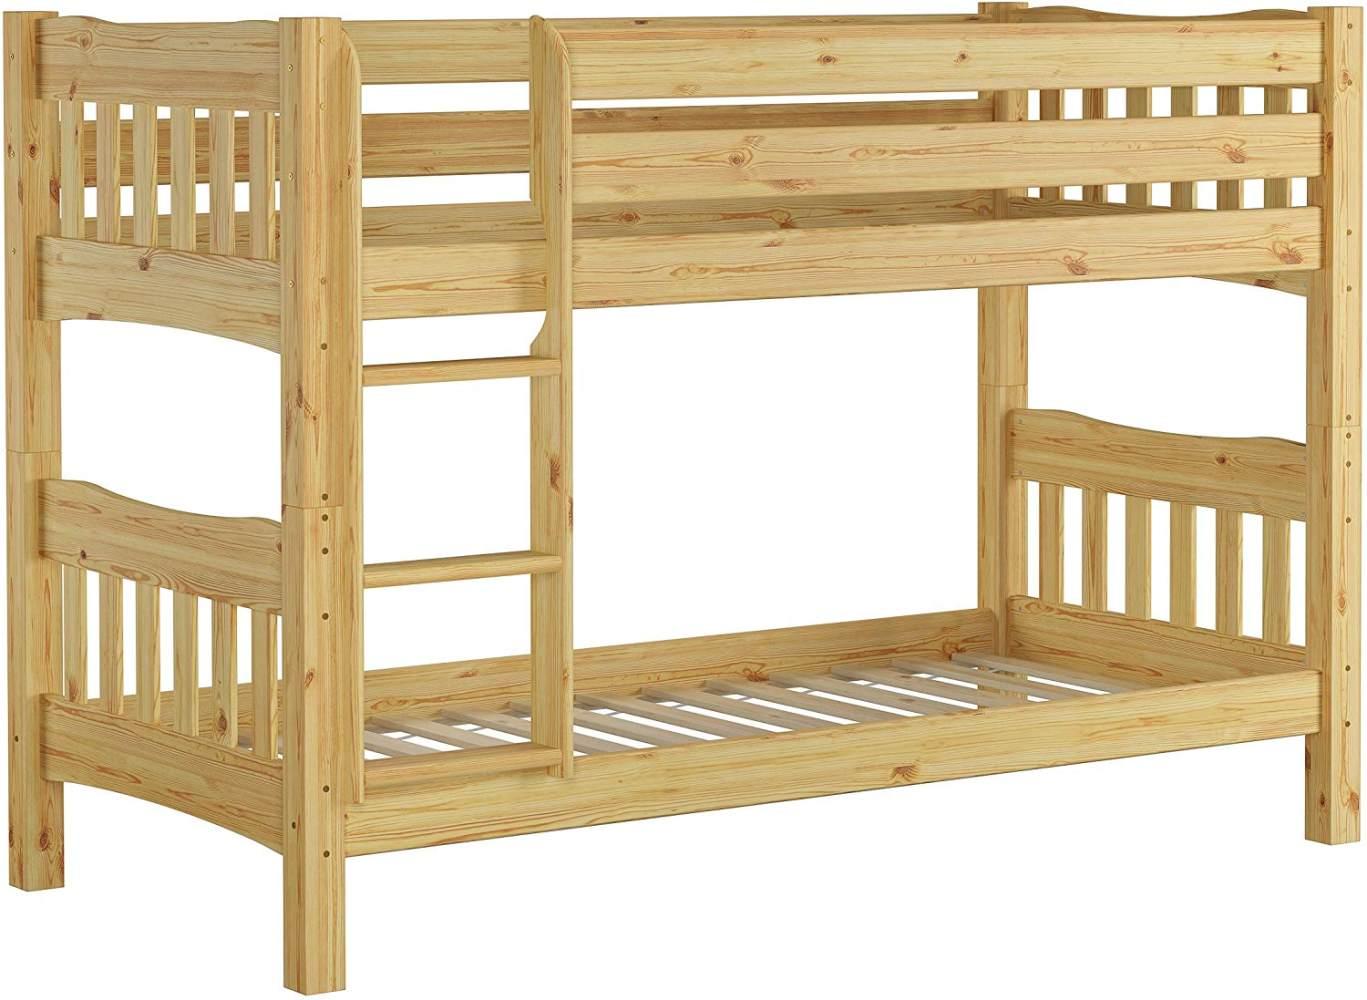 Erst-Holz Etagenbett Kiefer 90x200, natur Bild 1